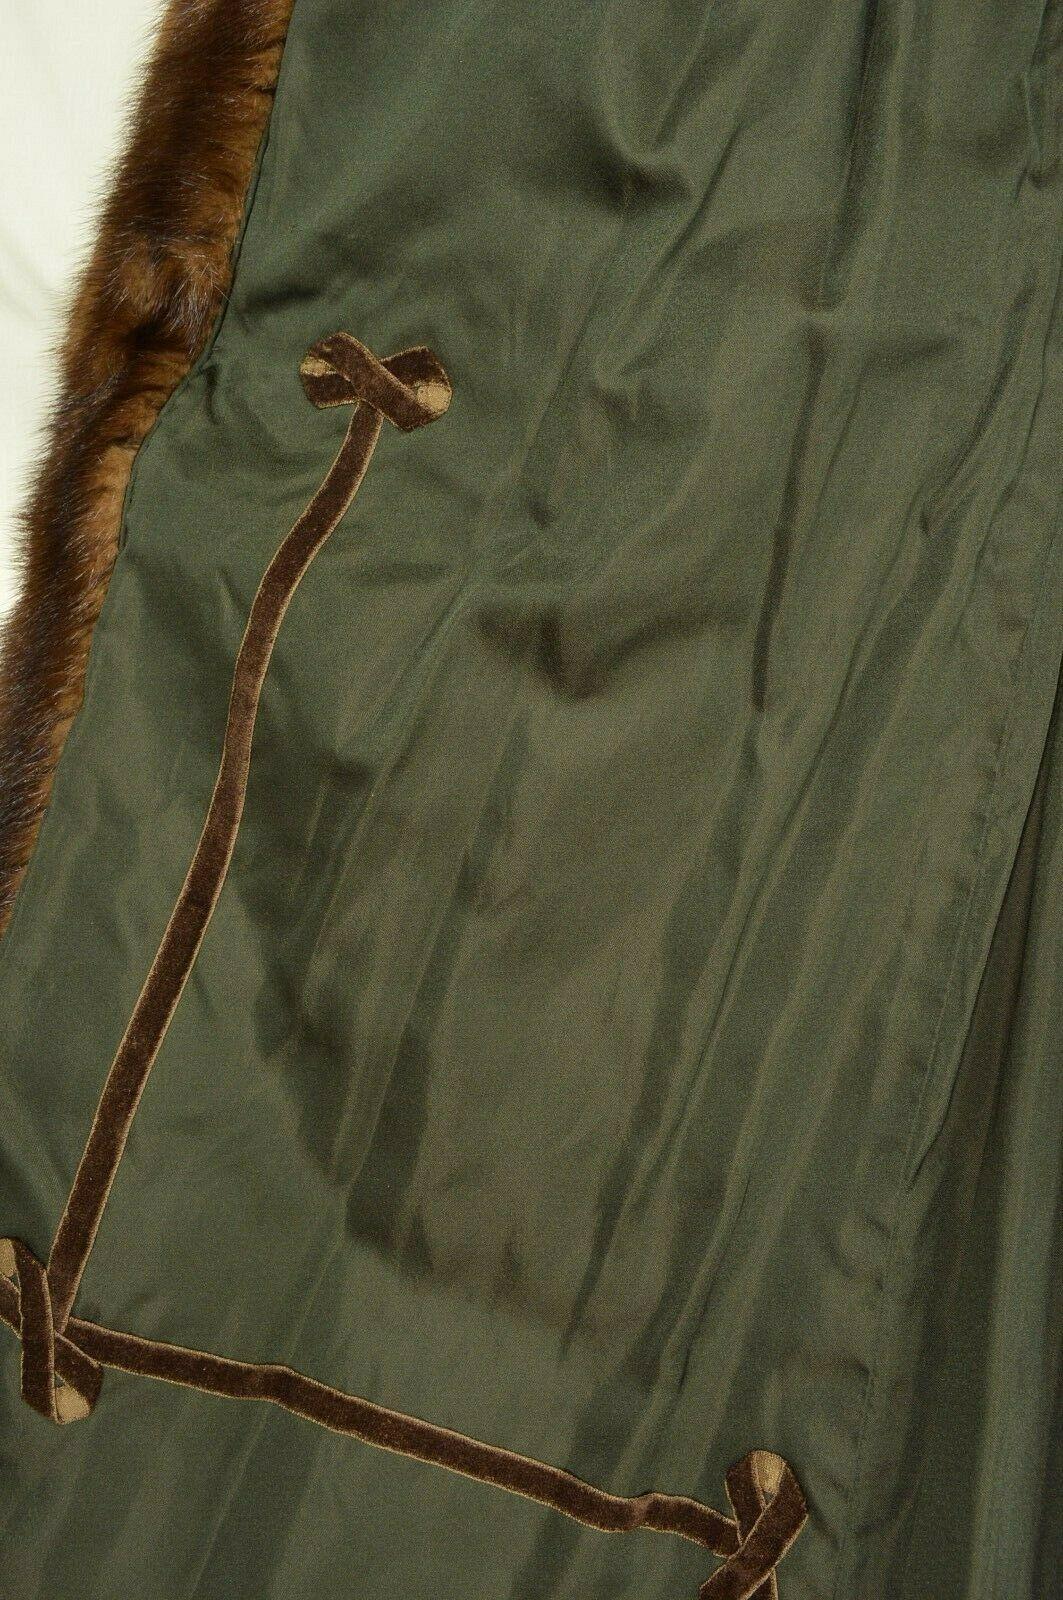 France Olivia mink fur coat FR 44 full length mahogany chic sophisticate brown image 10